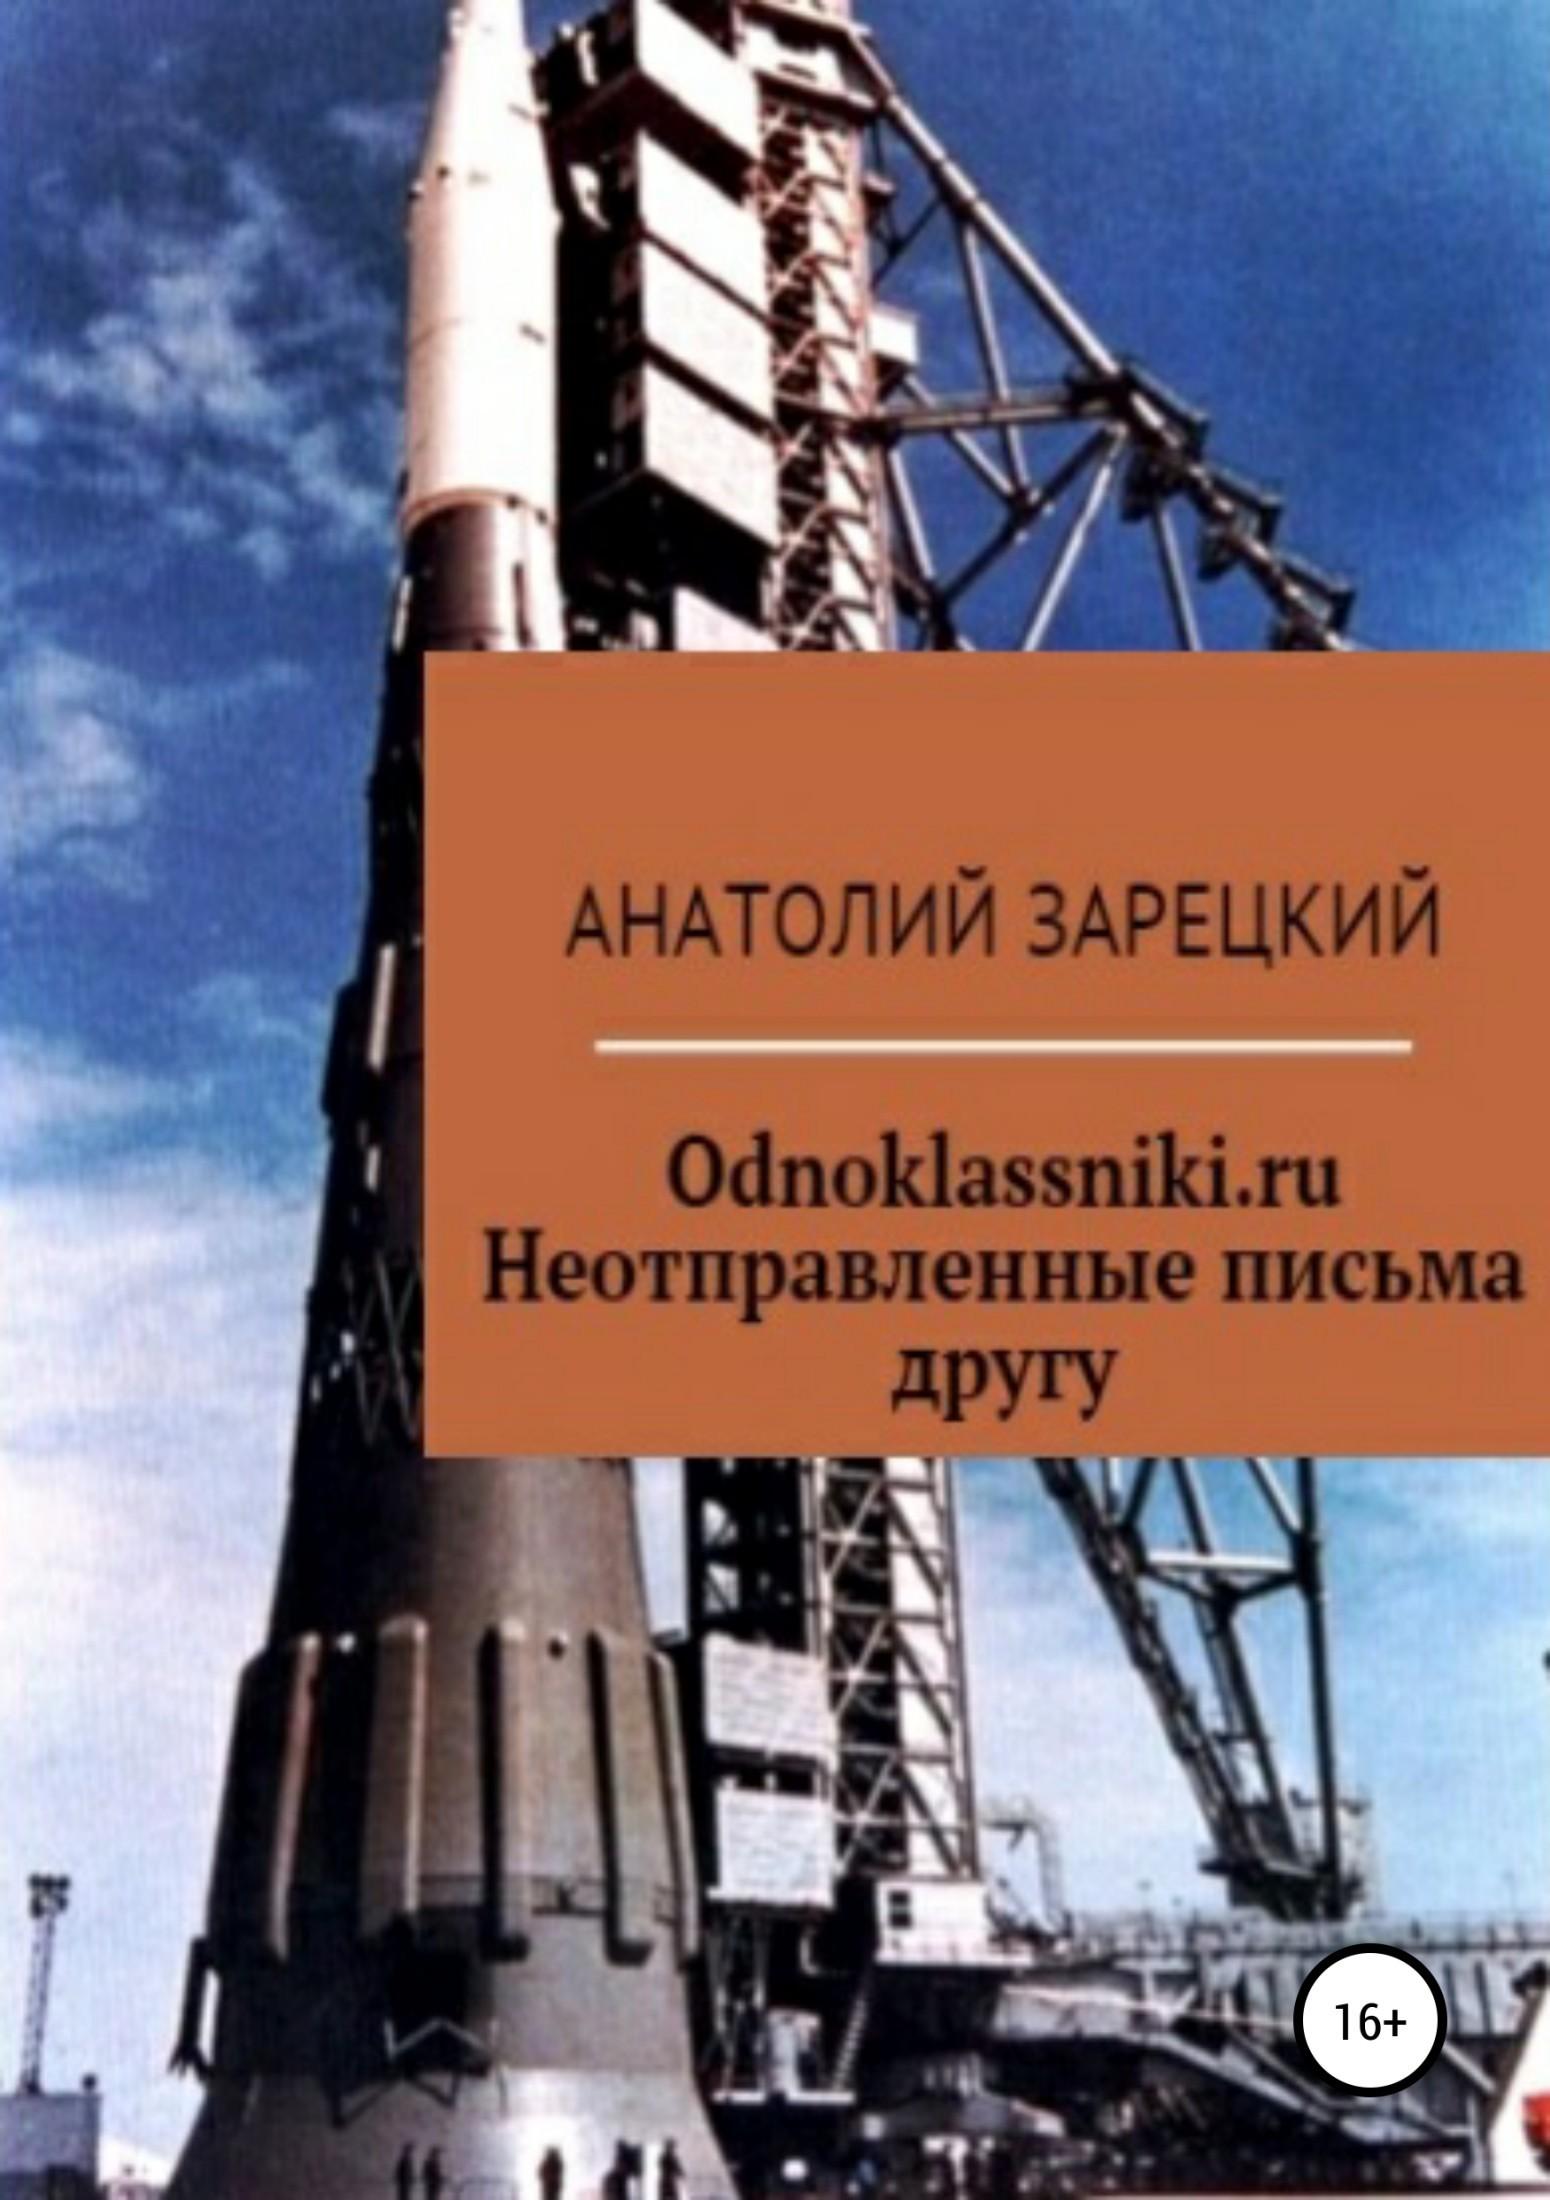 Odnoklassniki.ru. Неотправленные письма другу